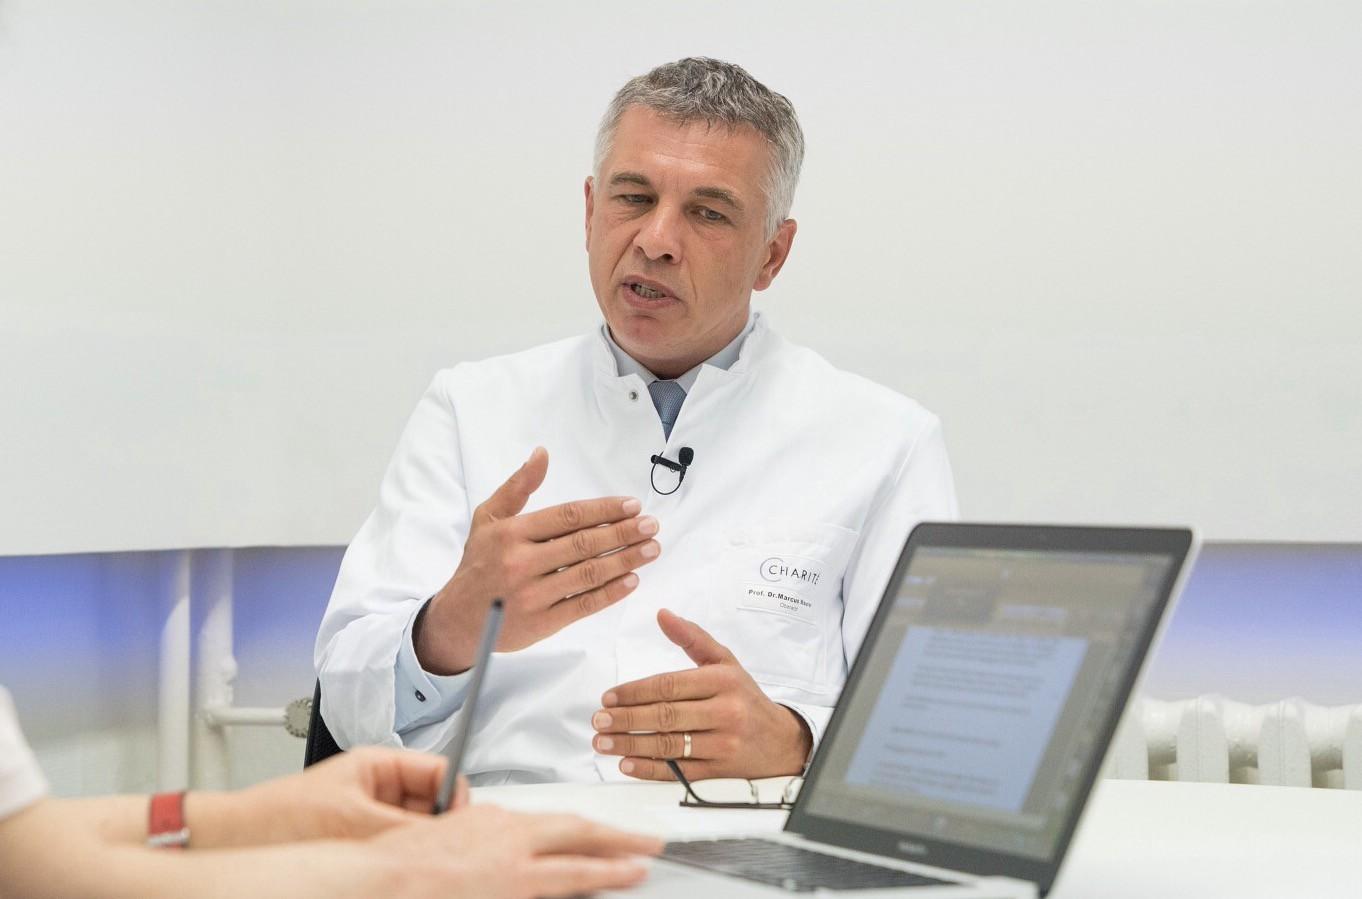 Prof. Dr. Marcus Maurer